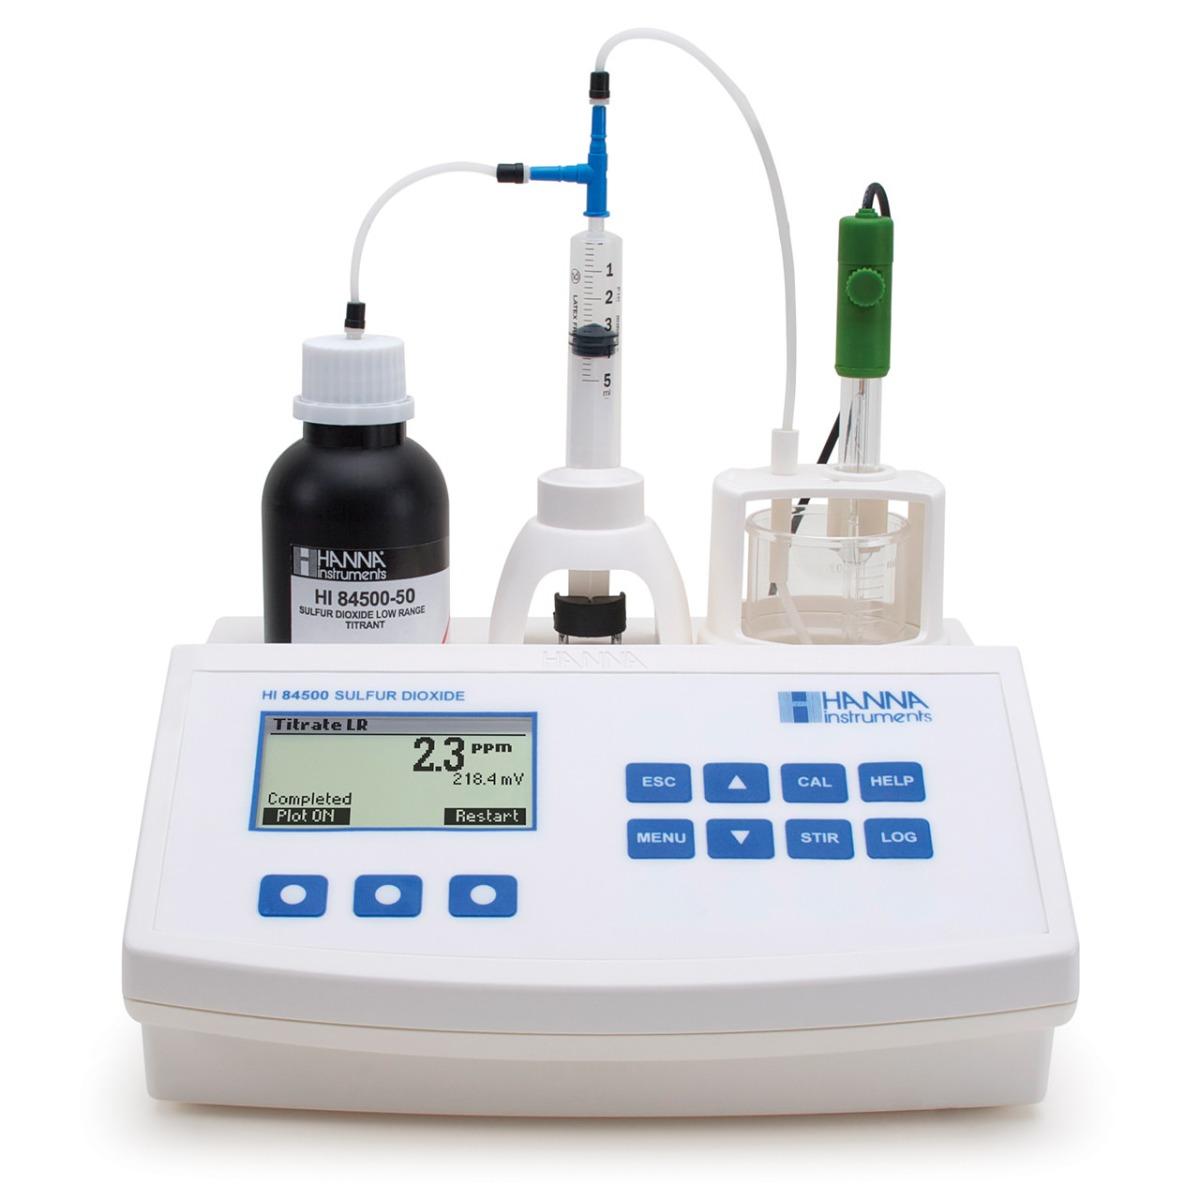 HI84500 Sulfur Dioxide Mini Titrator for Wine Analysis